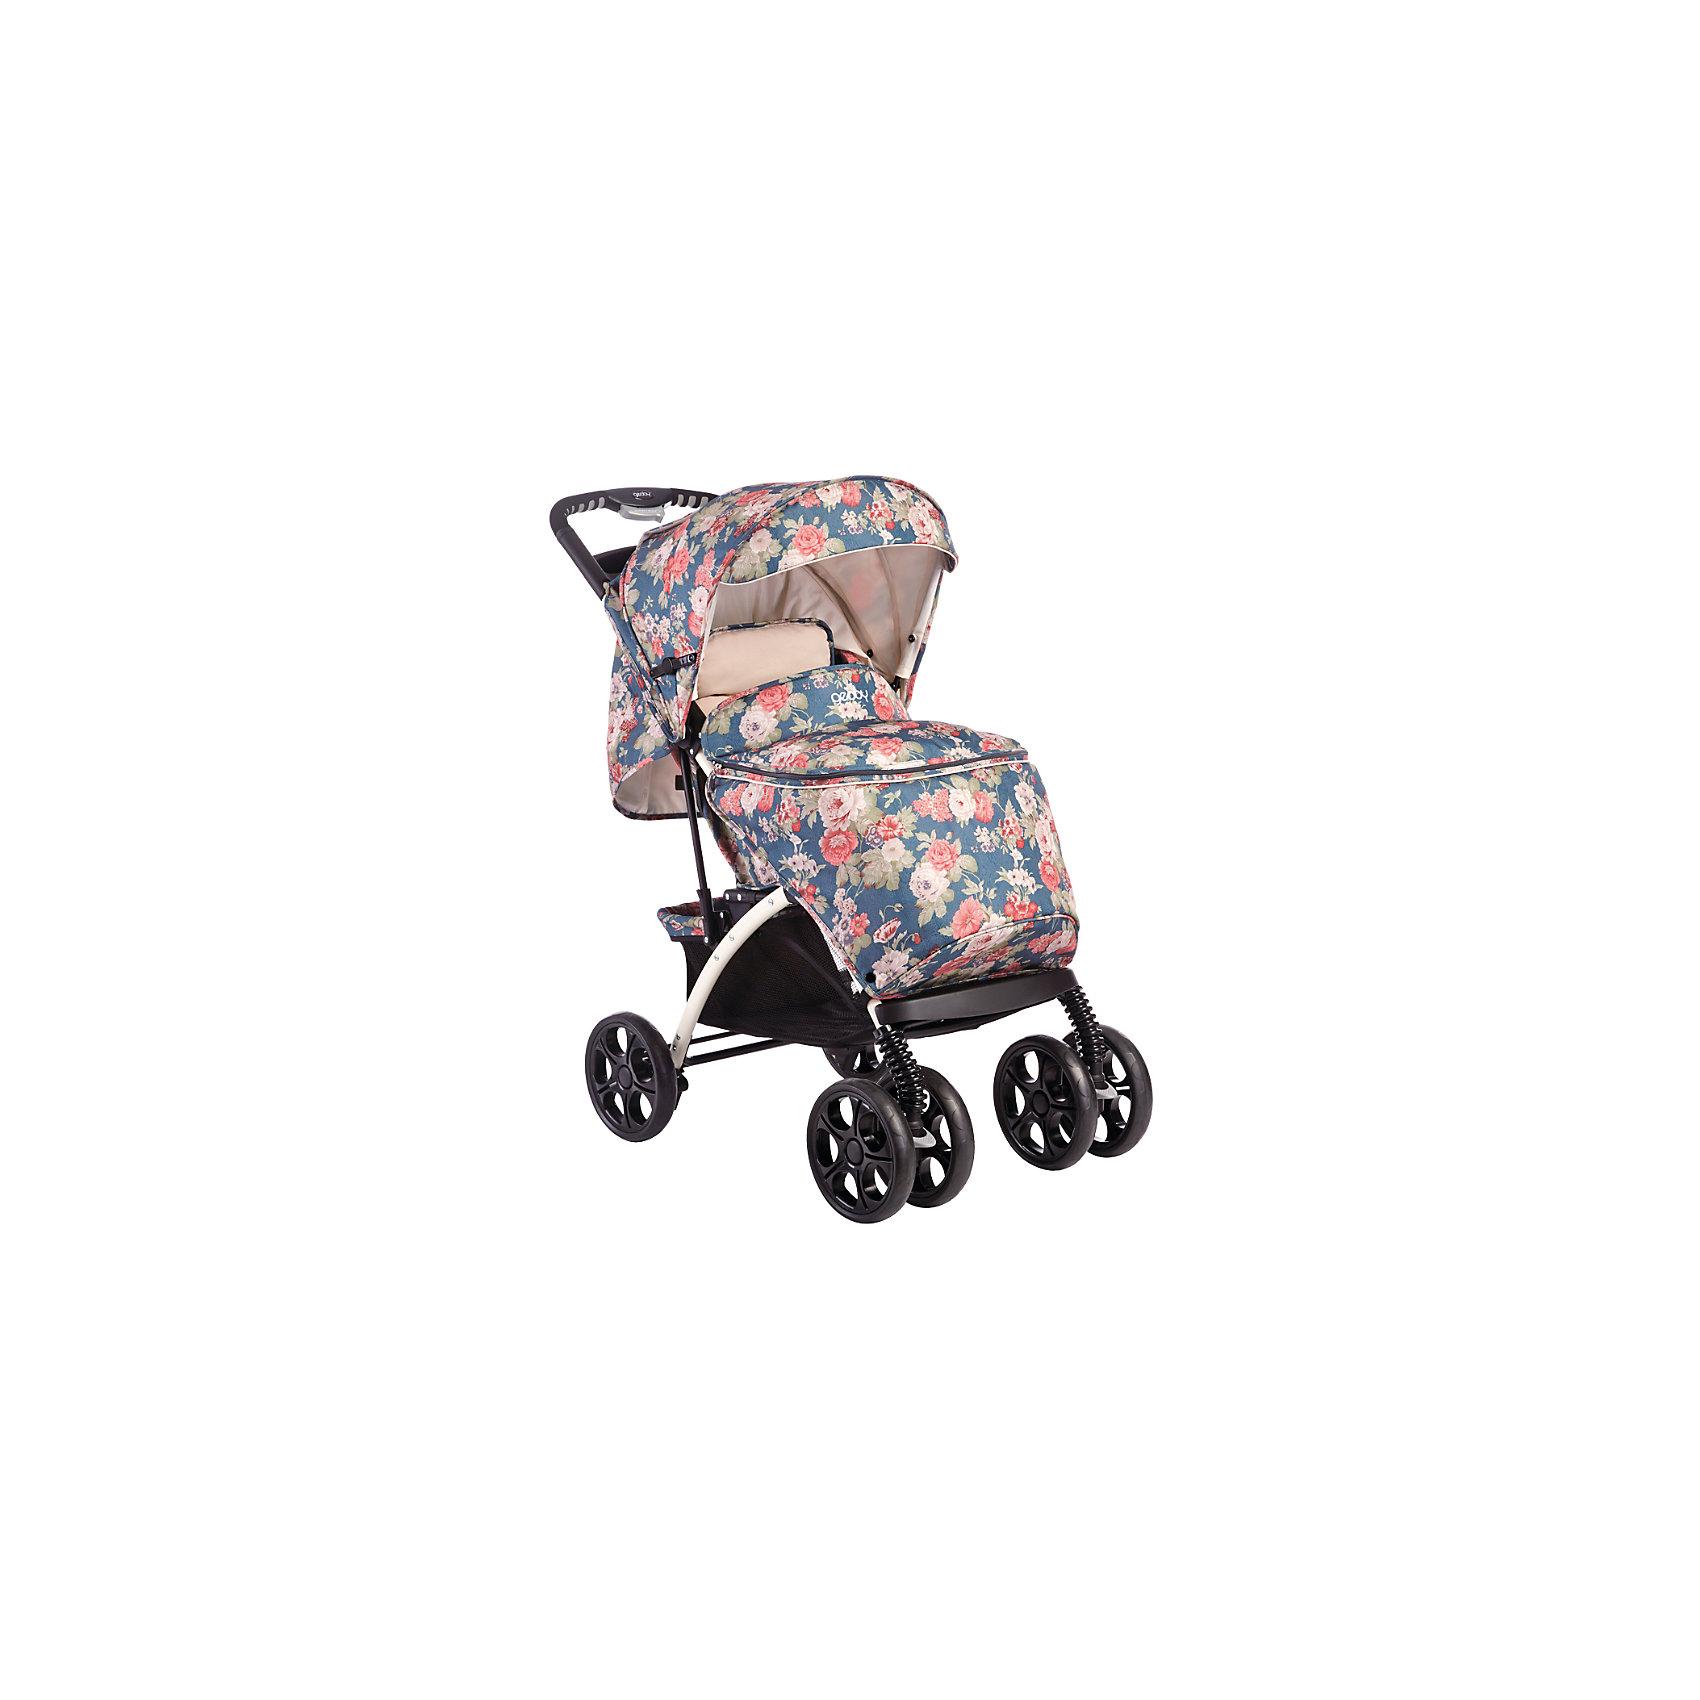 Прогулочная коляска C819R01 (RZHS), Geoby, бордовый/серый